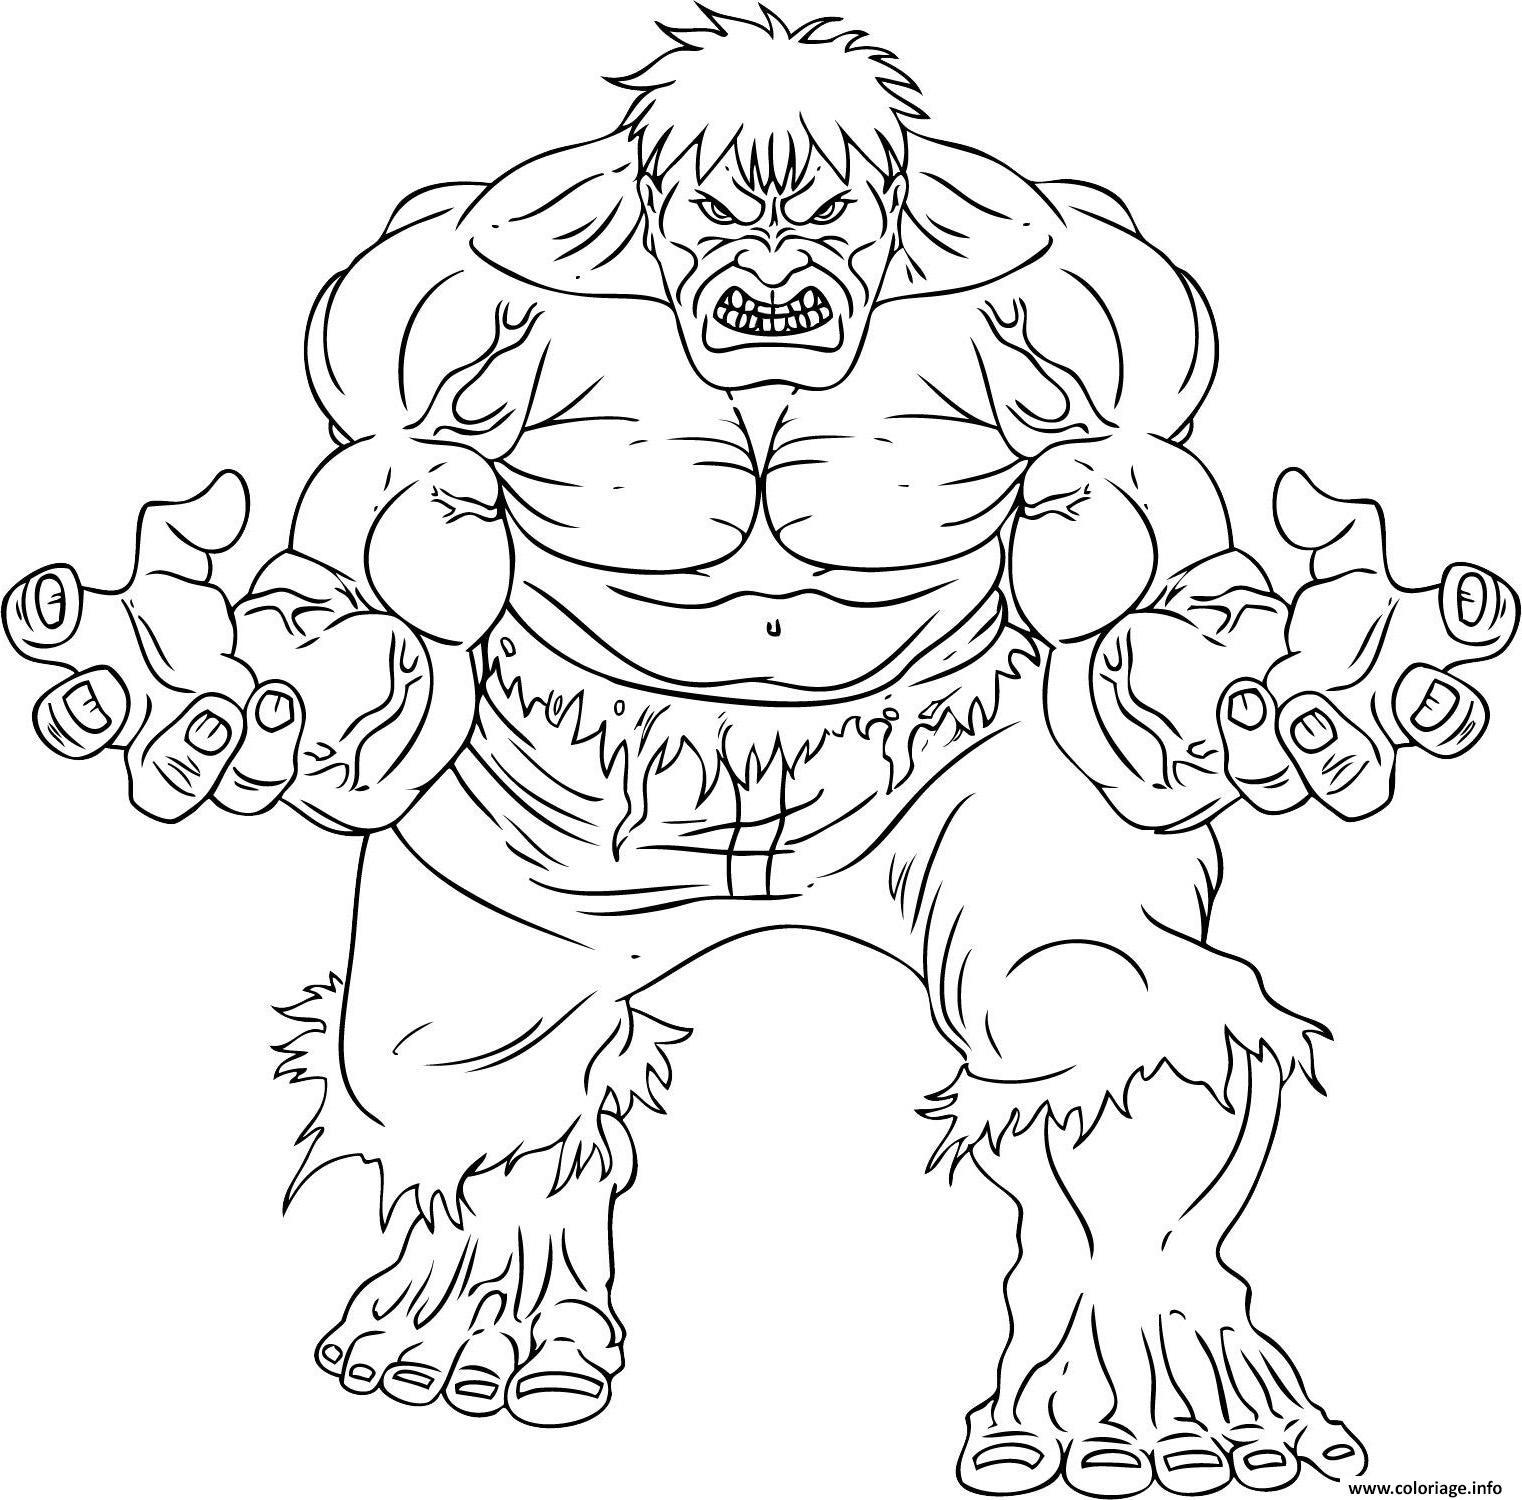 Coloriage Avengers Transformation Hulk dessin